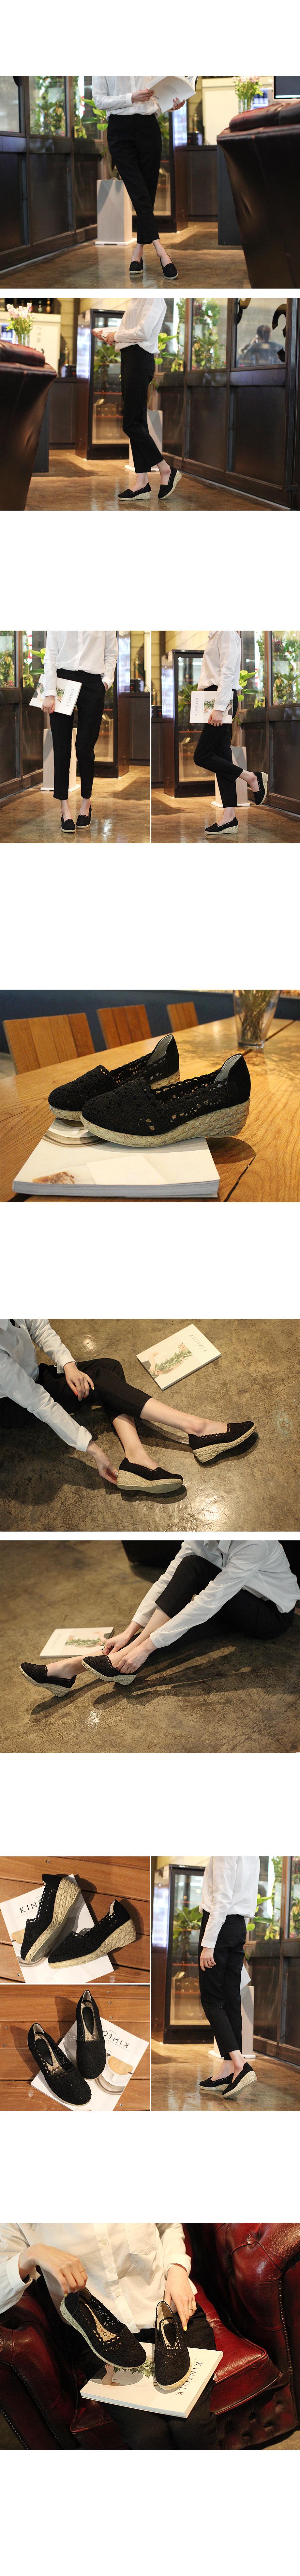 Morian Espadue Wedge Heels 2cm, 5cm